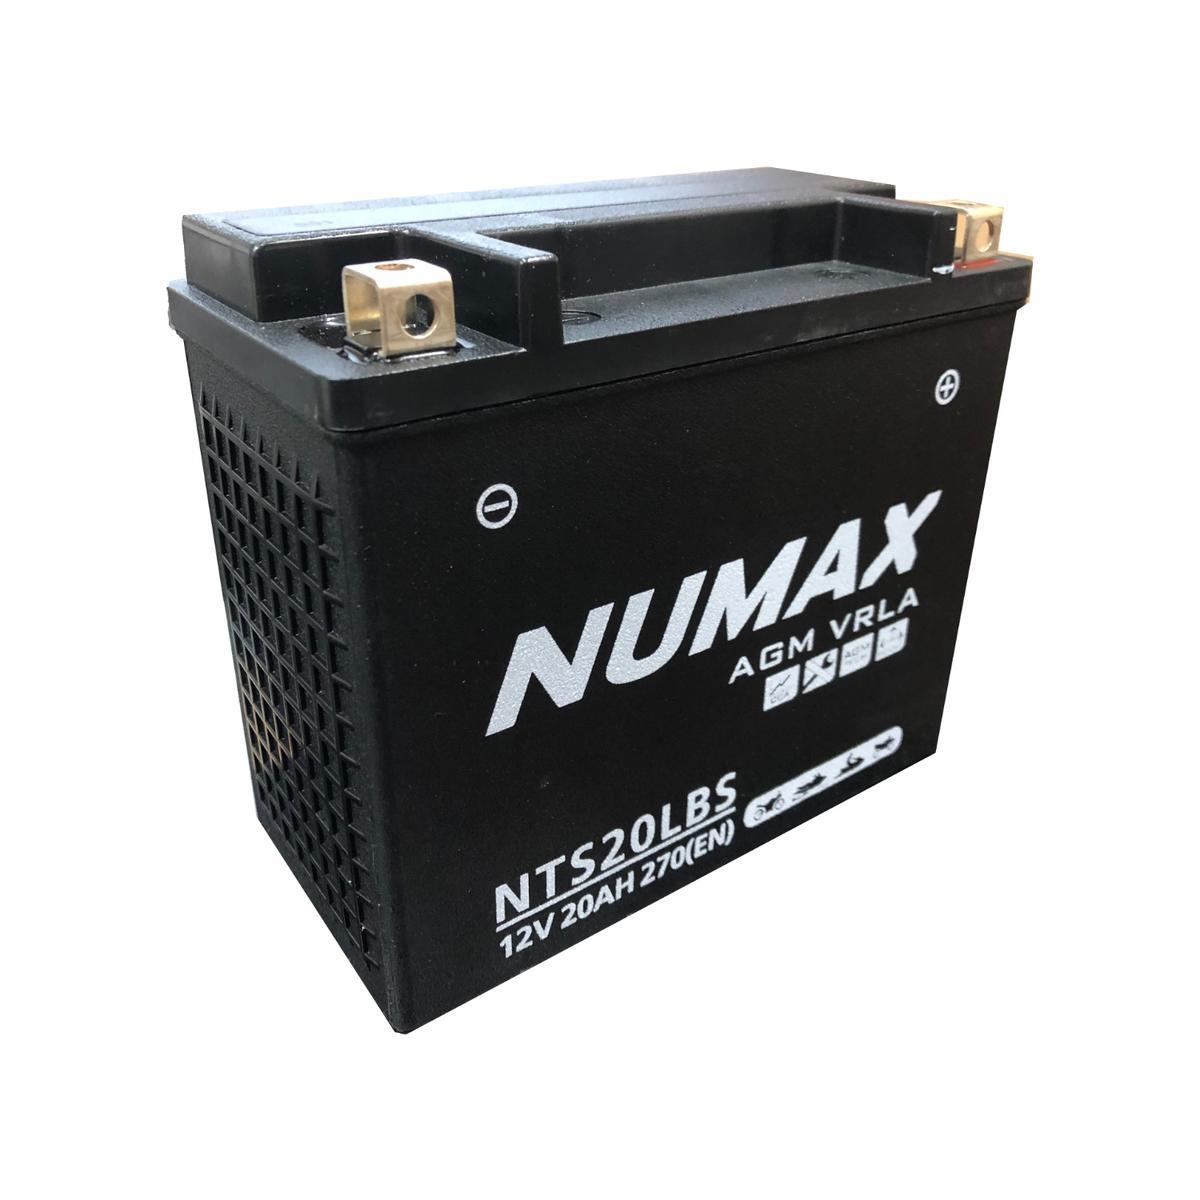 Numax NTS20LBS Harley Davidson 1450 FXST Series Battery